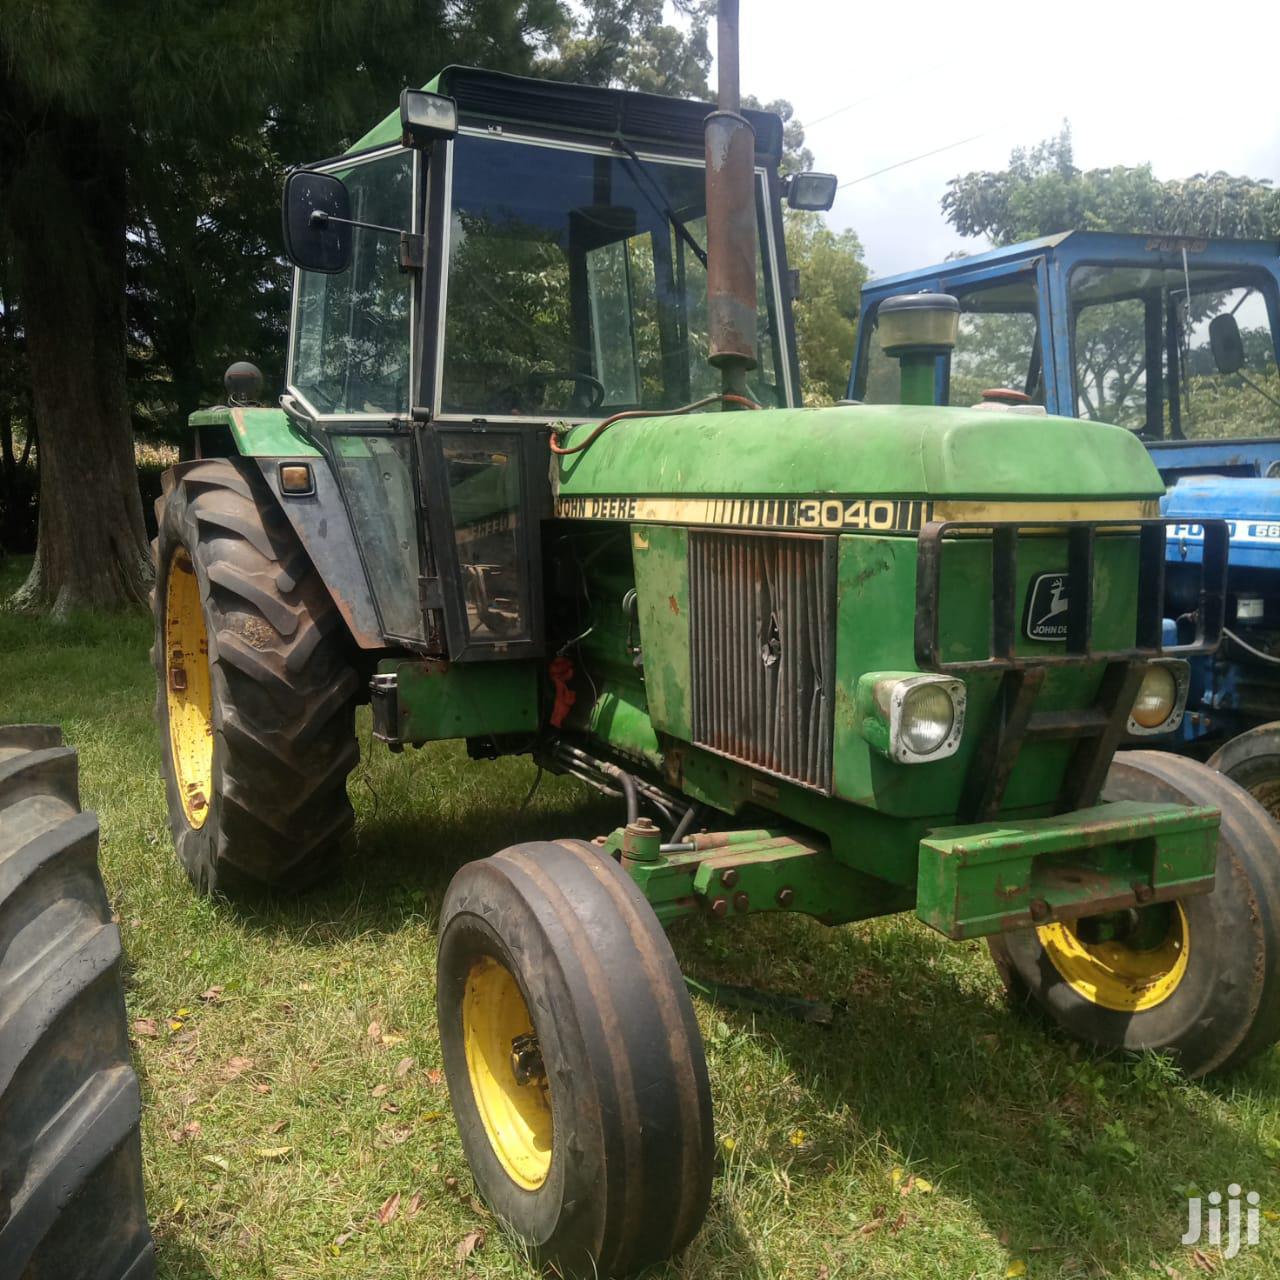 John Deere 3040 | Heavy Equipment for sale in Njoro, Nakuru, Kenya